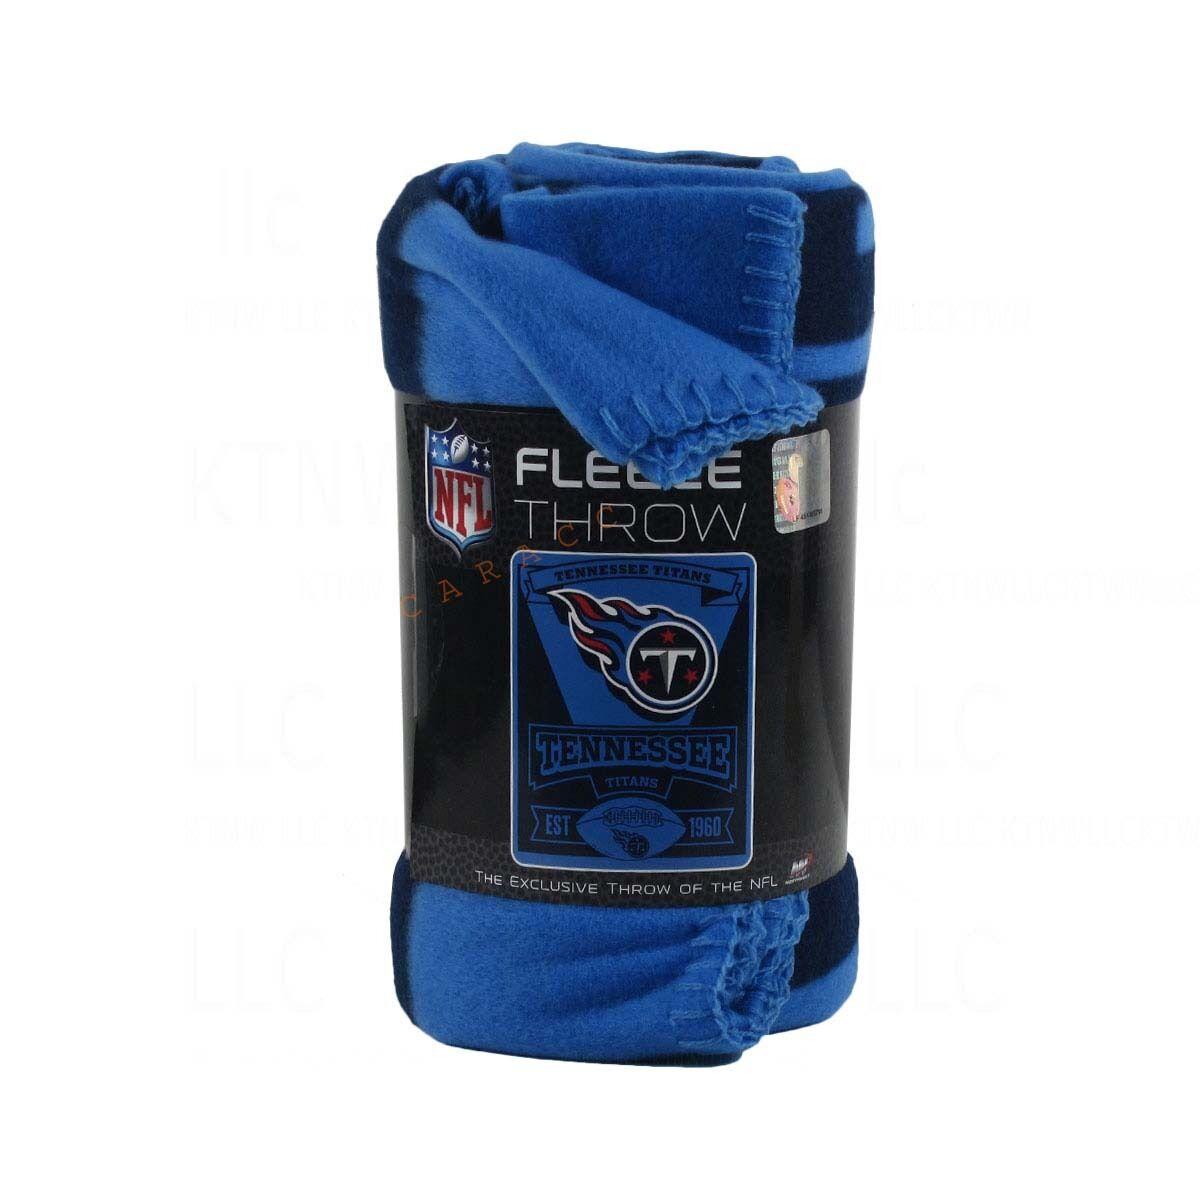 "New NFL Football SOFT Fleece Throw Blanket 50"" x 60"" Pick Your Team - ON SALE"